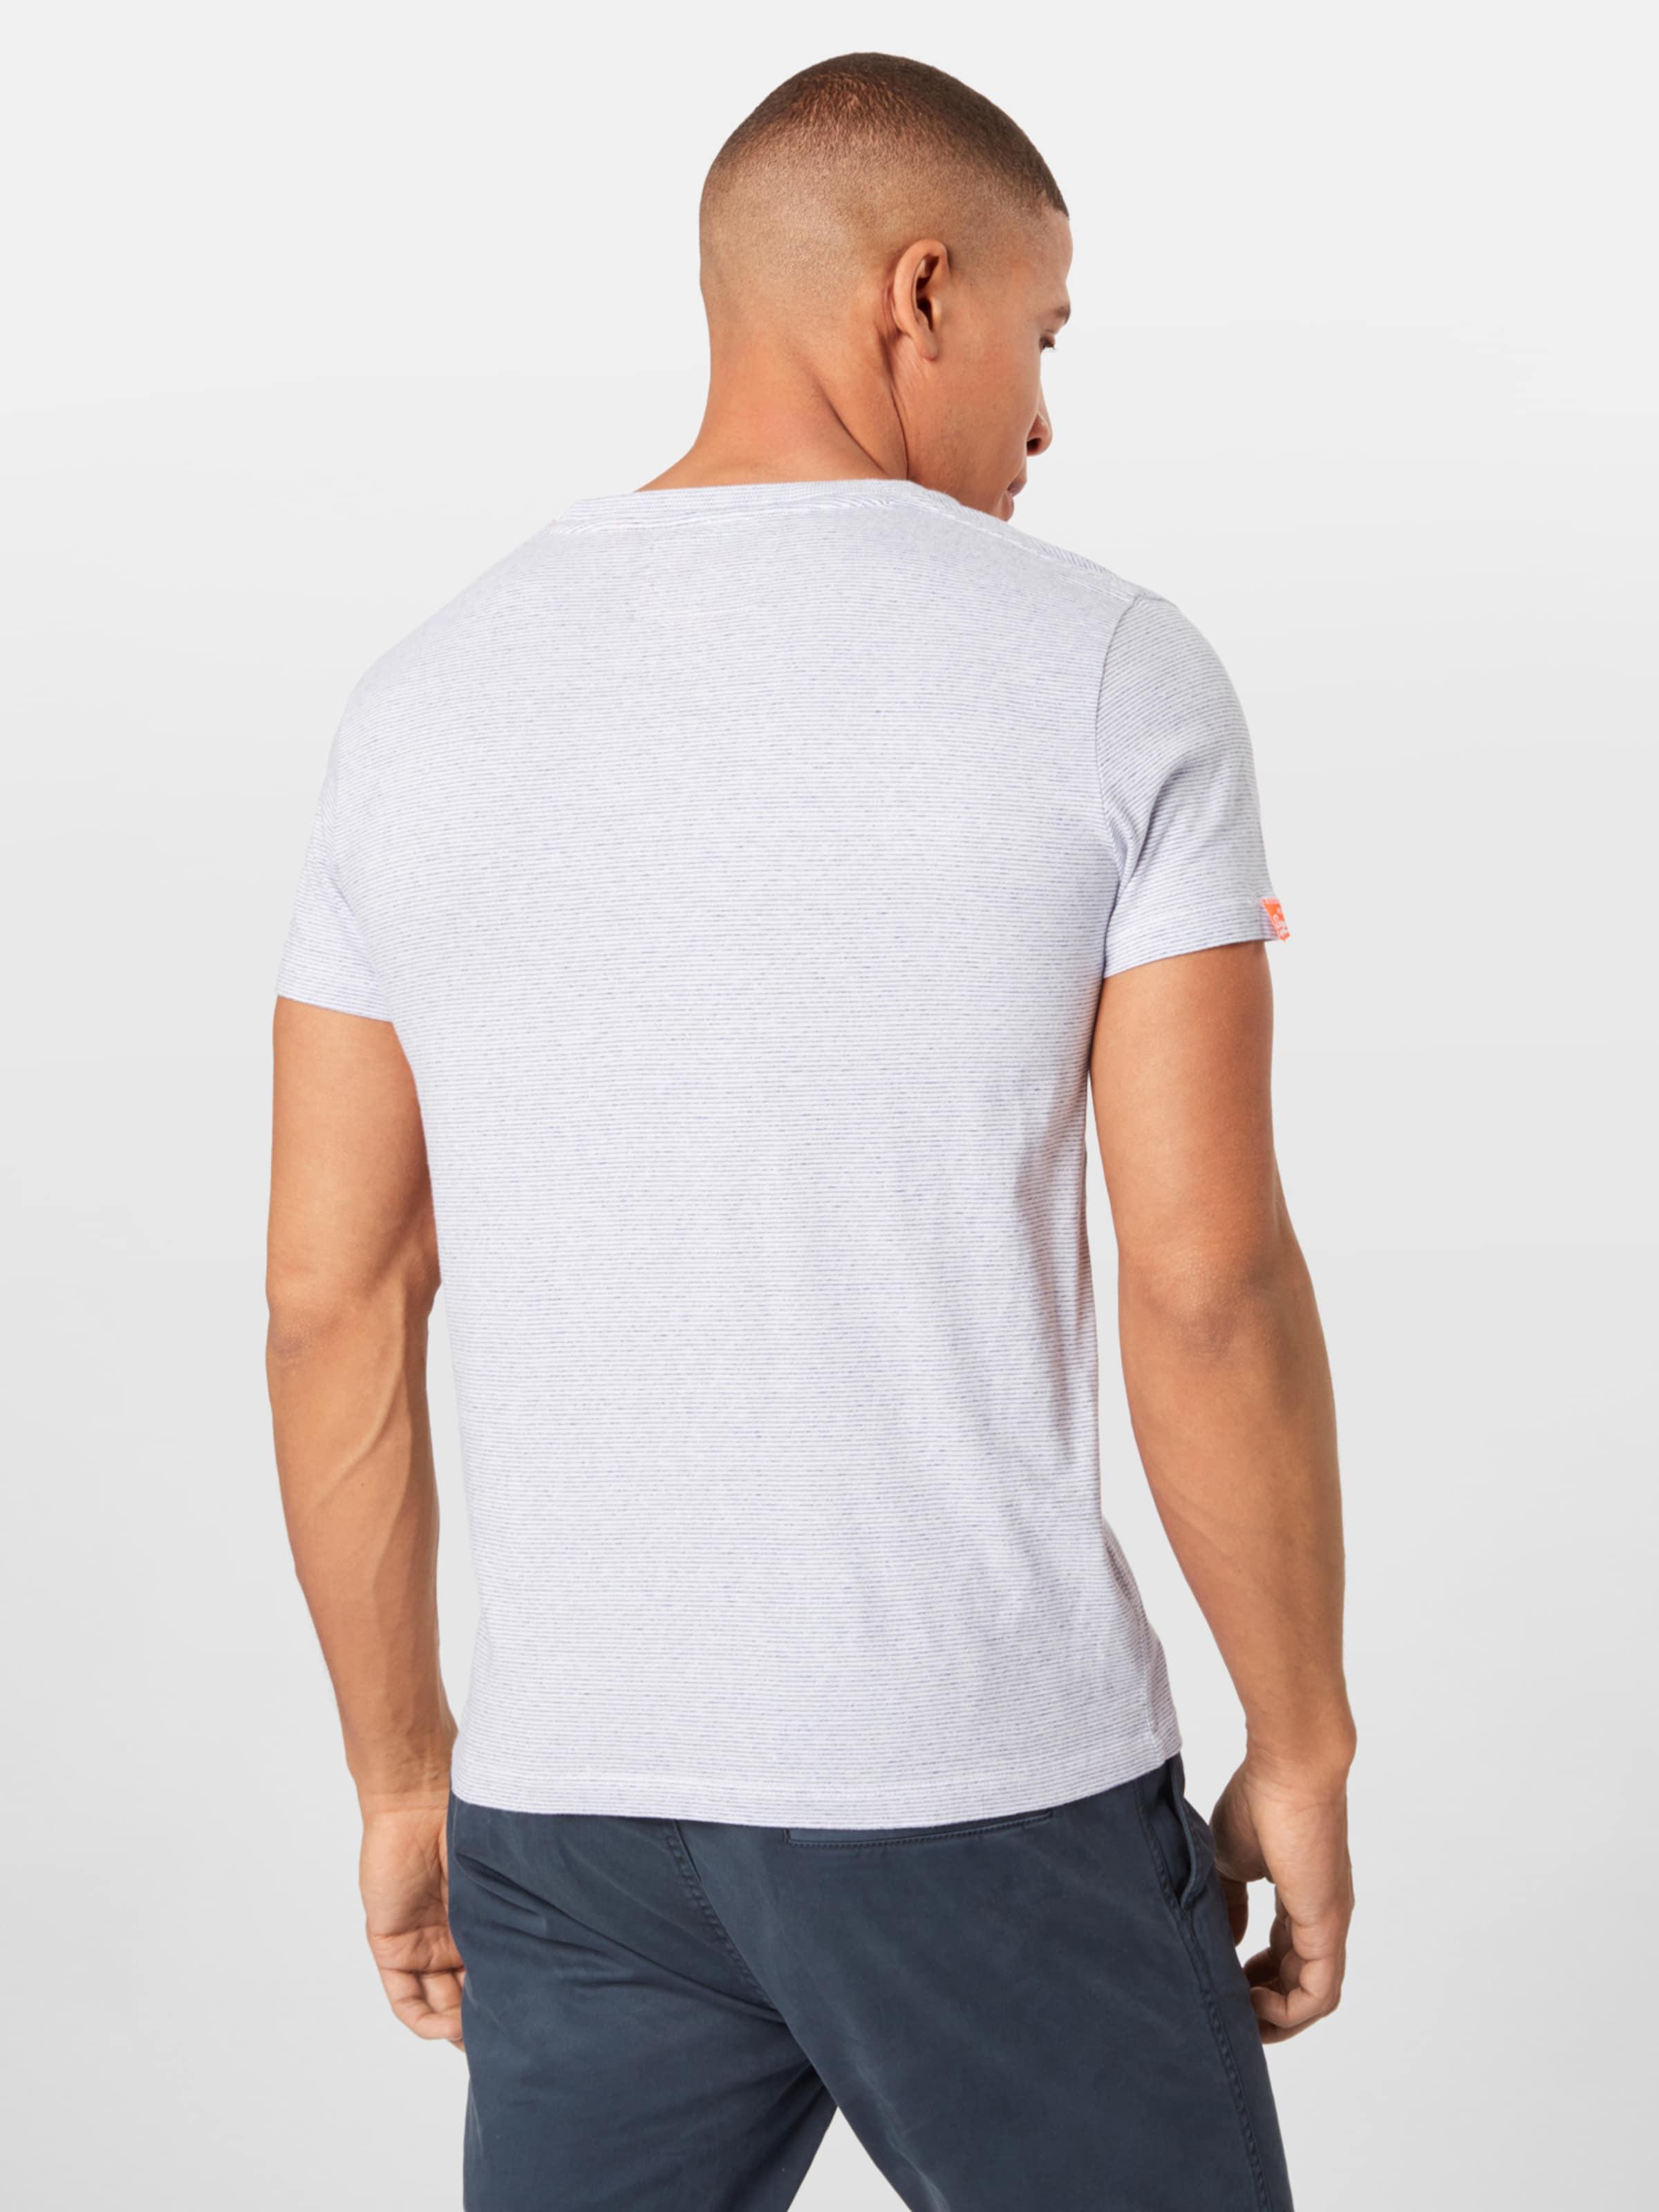 Tee' In Shirt Label Vintage 'orange Blau Superdry Embroidery XiwTkZOPu